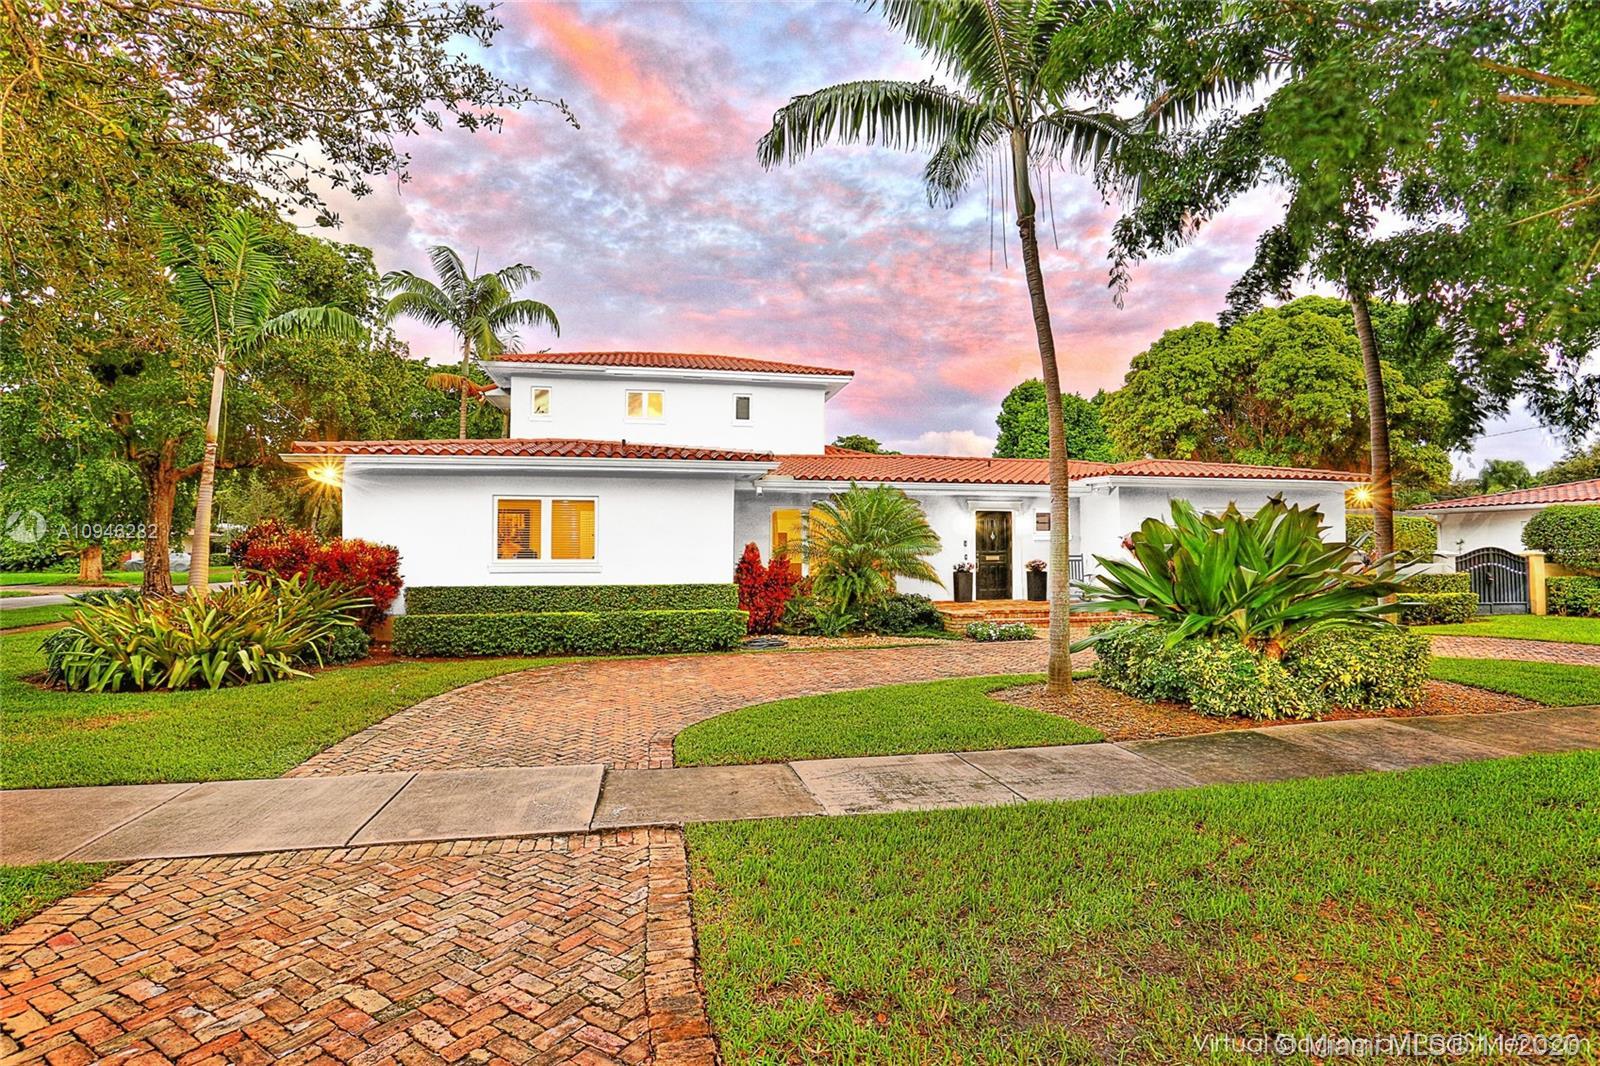 South Miami - 5601 San Vicente St, Coral Gables, FL 33146